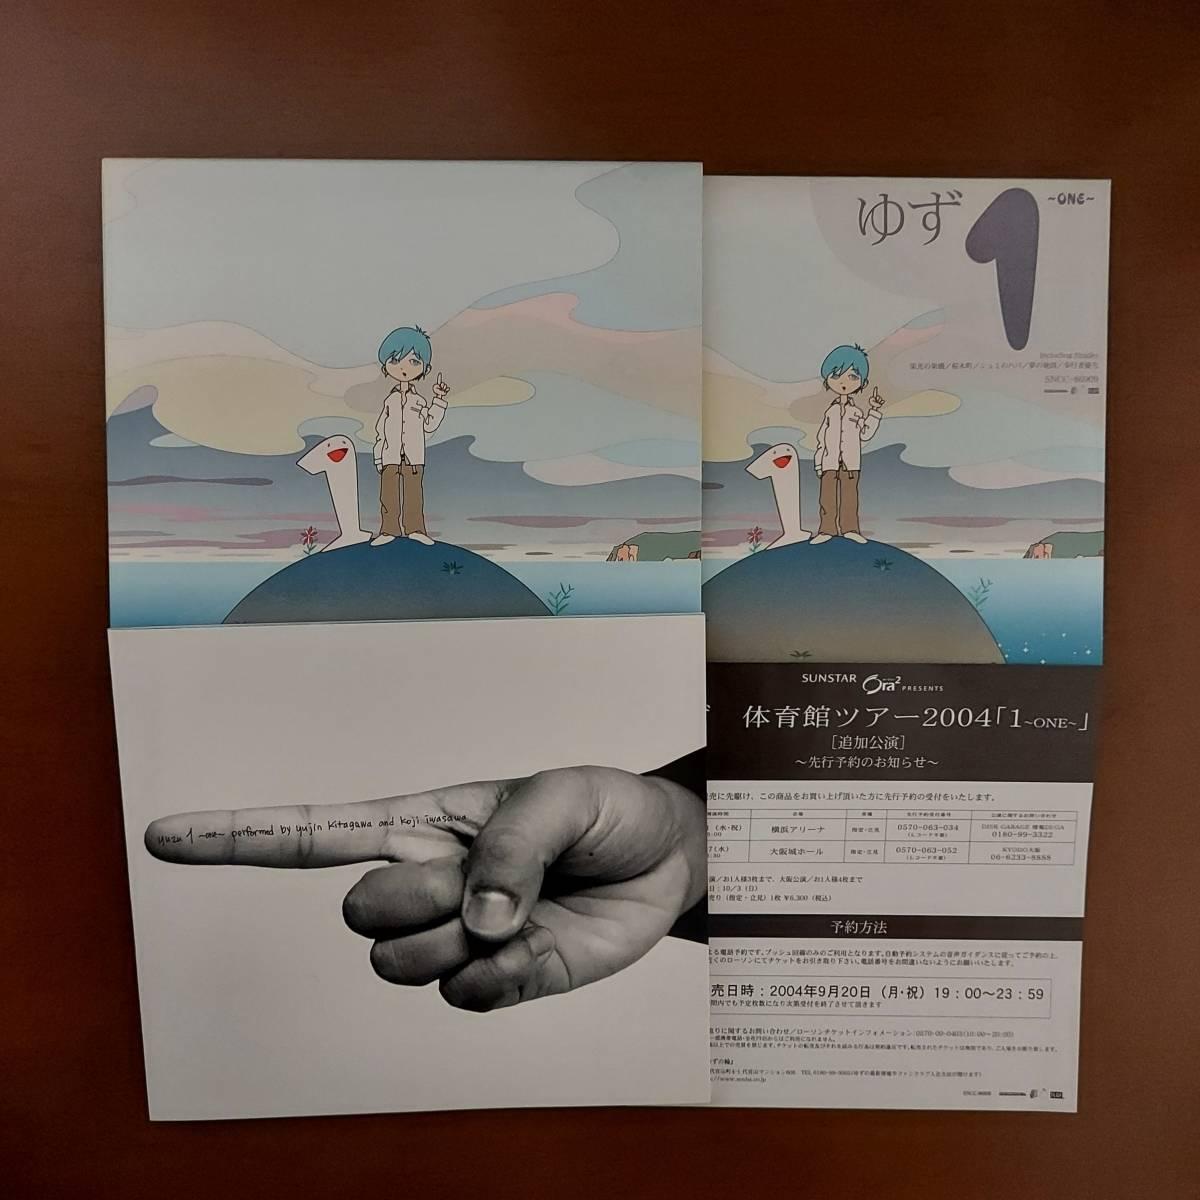 CD アルバム ゆず 1~ONE~ 2004年発売 栄光の架橋